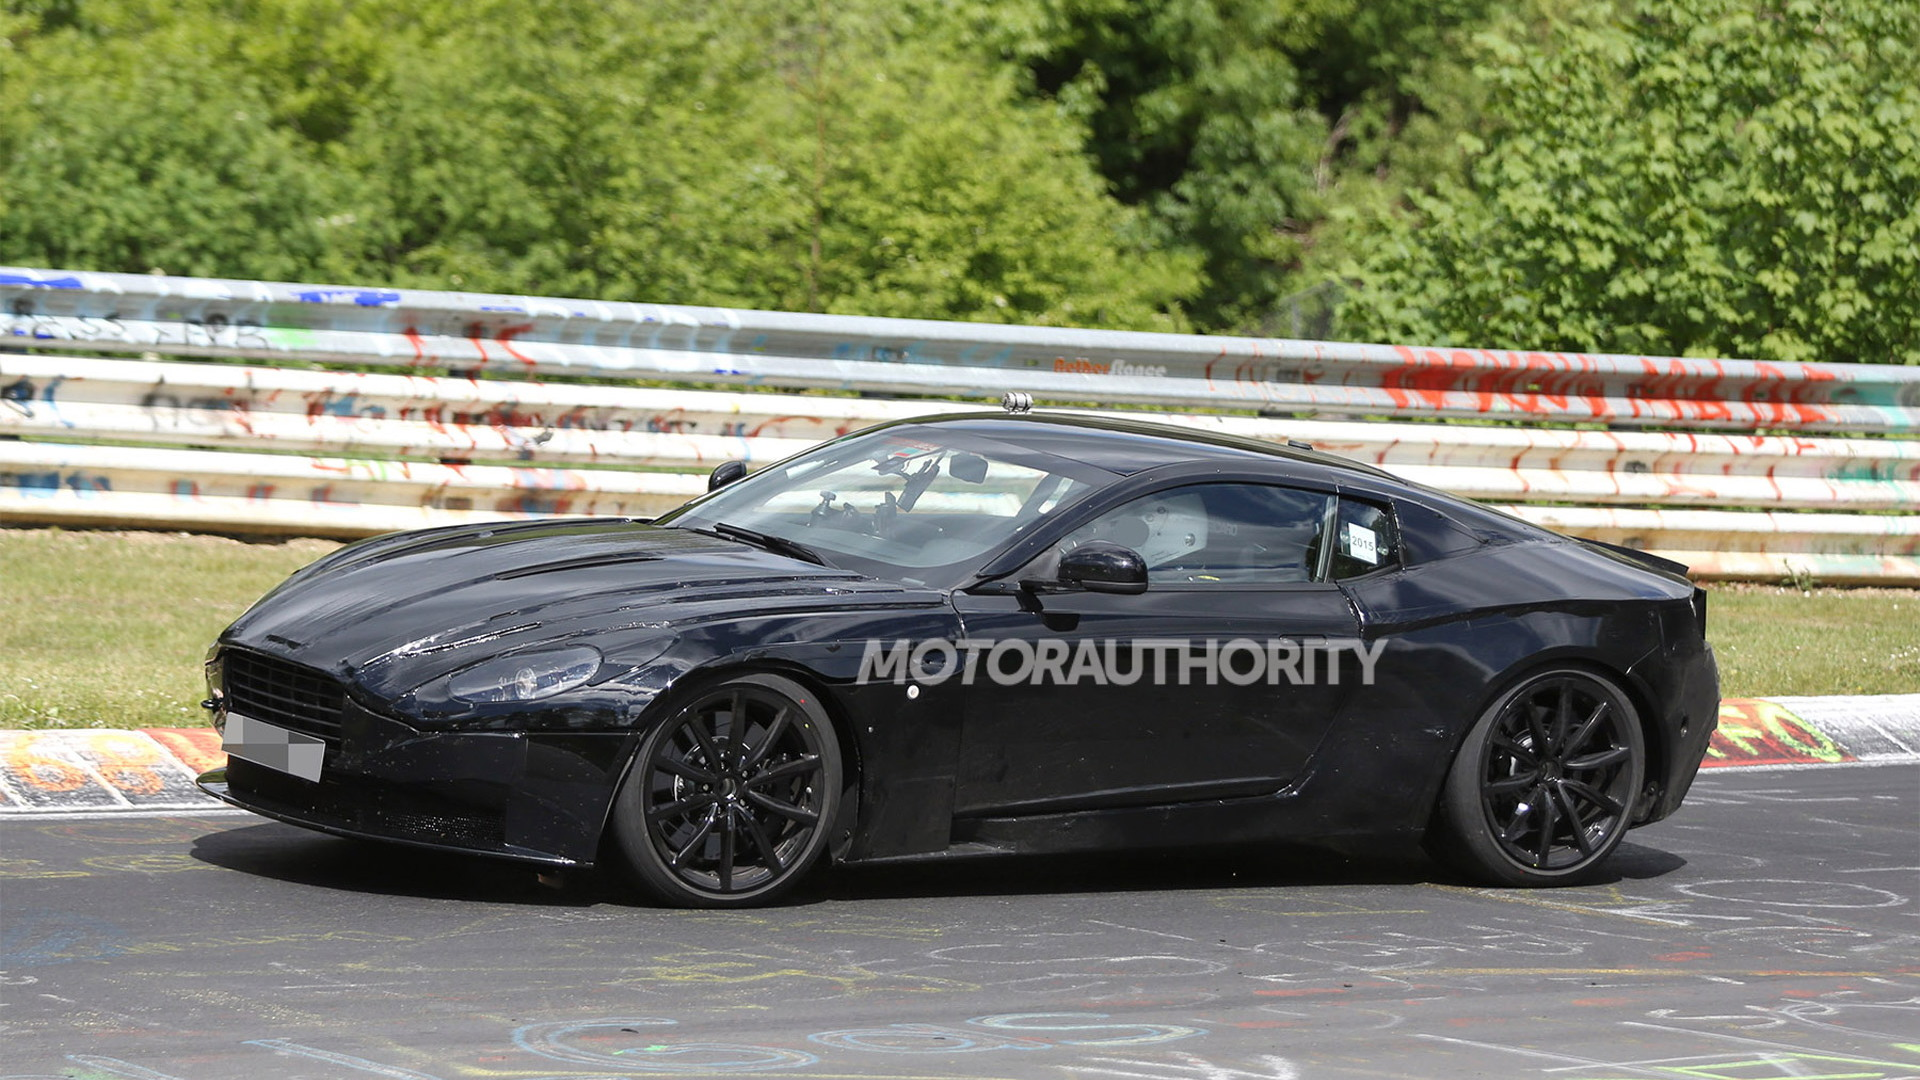 2017 Aston Martin DB11 (DB9 replacement) spy shots - Image via S. Baldauf/SB-Medien